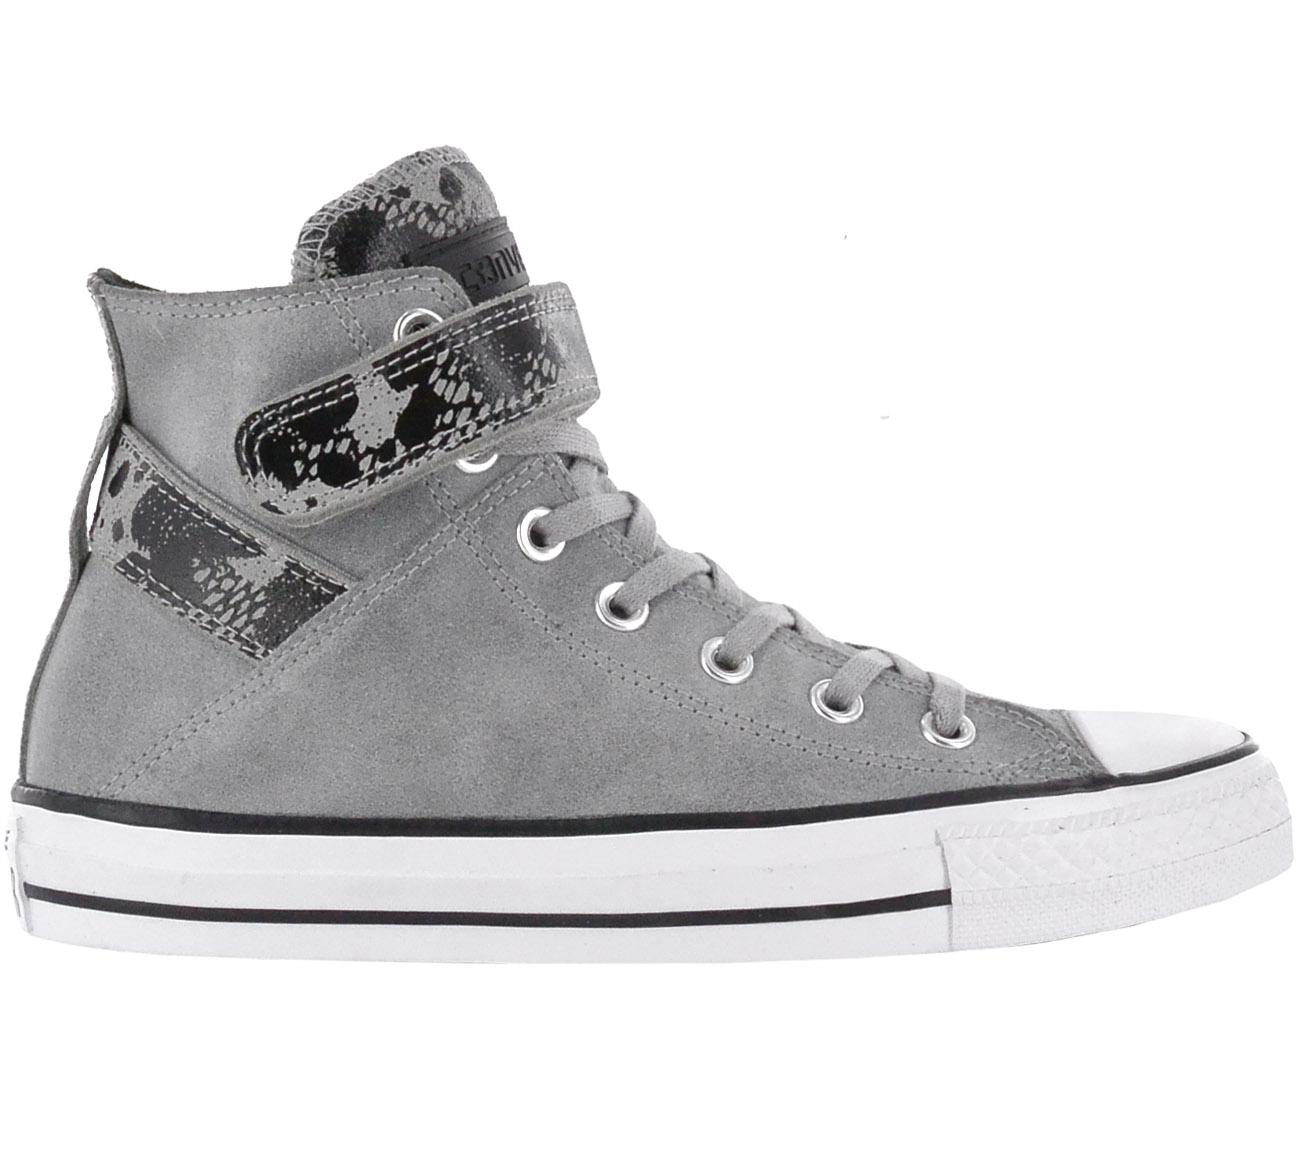 Converse Chuck Taylor All Star Donna Sneaker Pelle Ecopelle Scarpe da Ginnastica Chucks